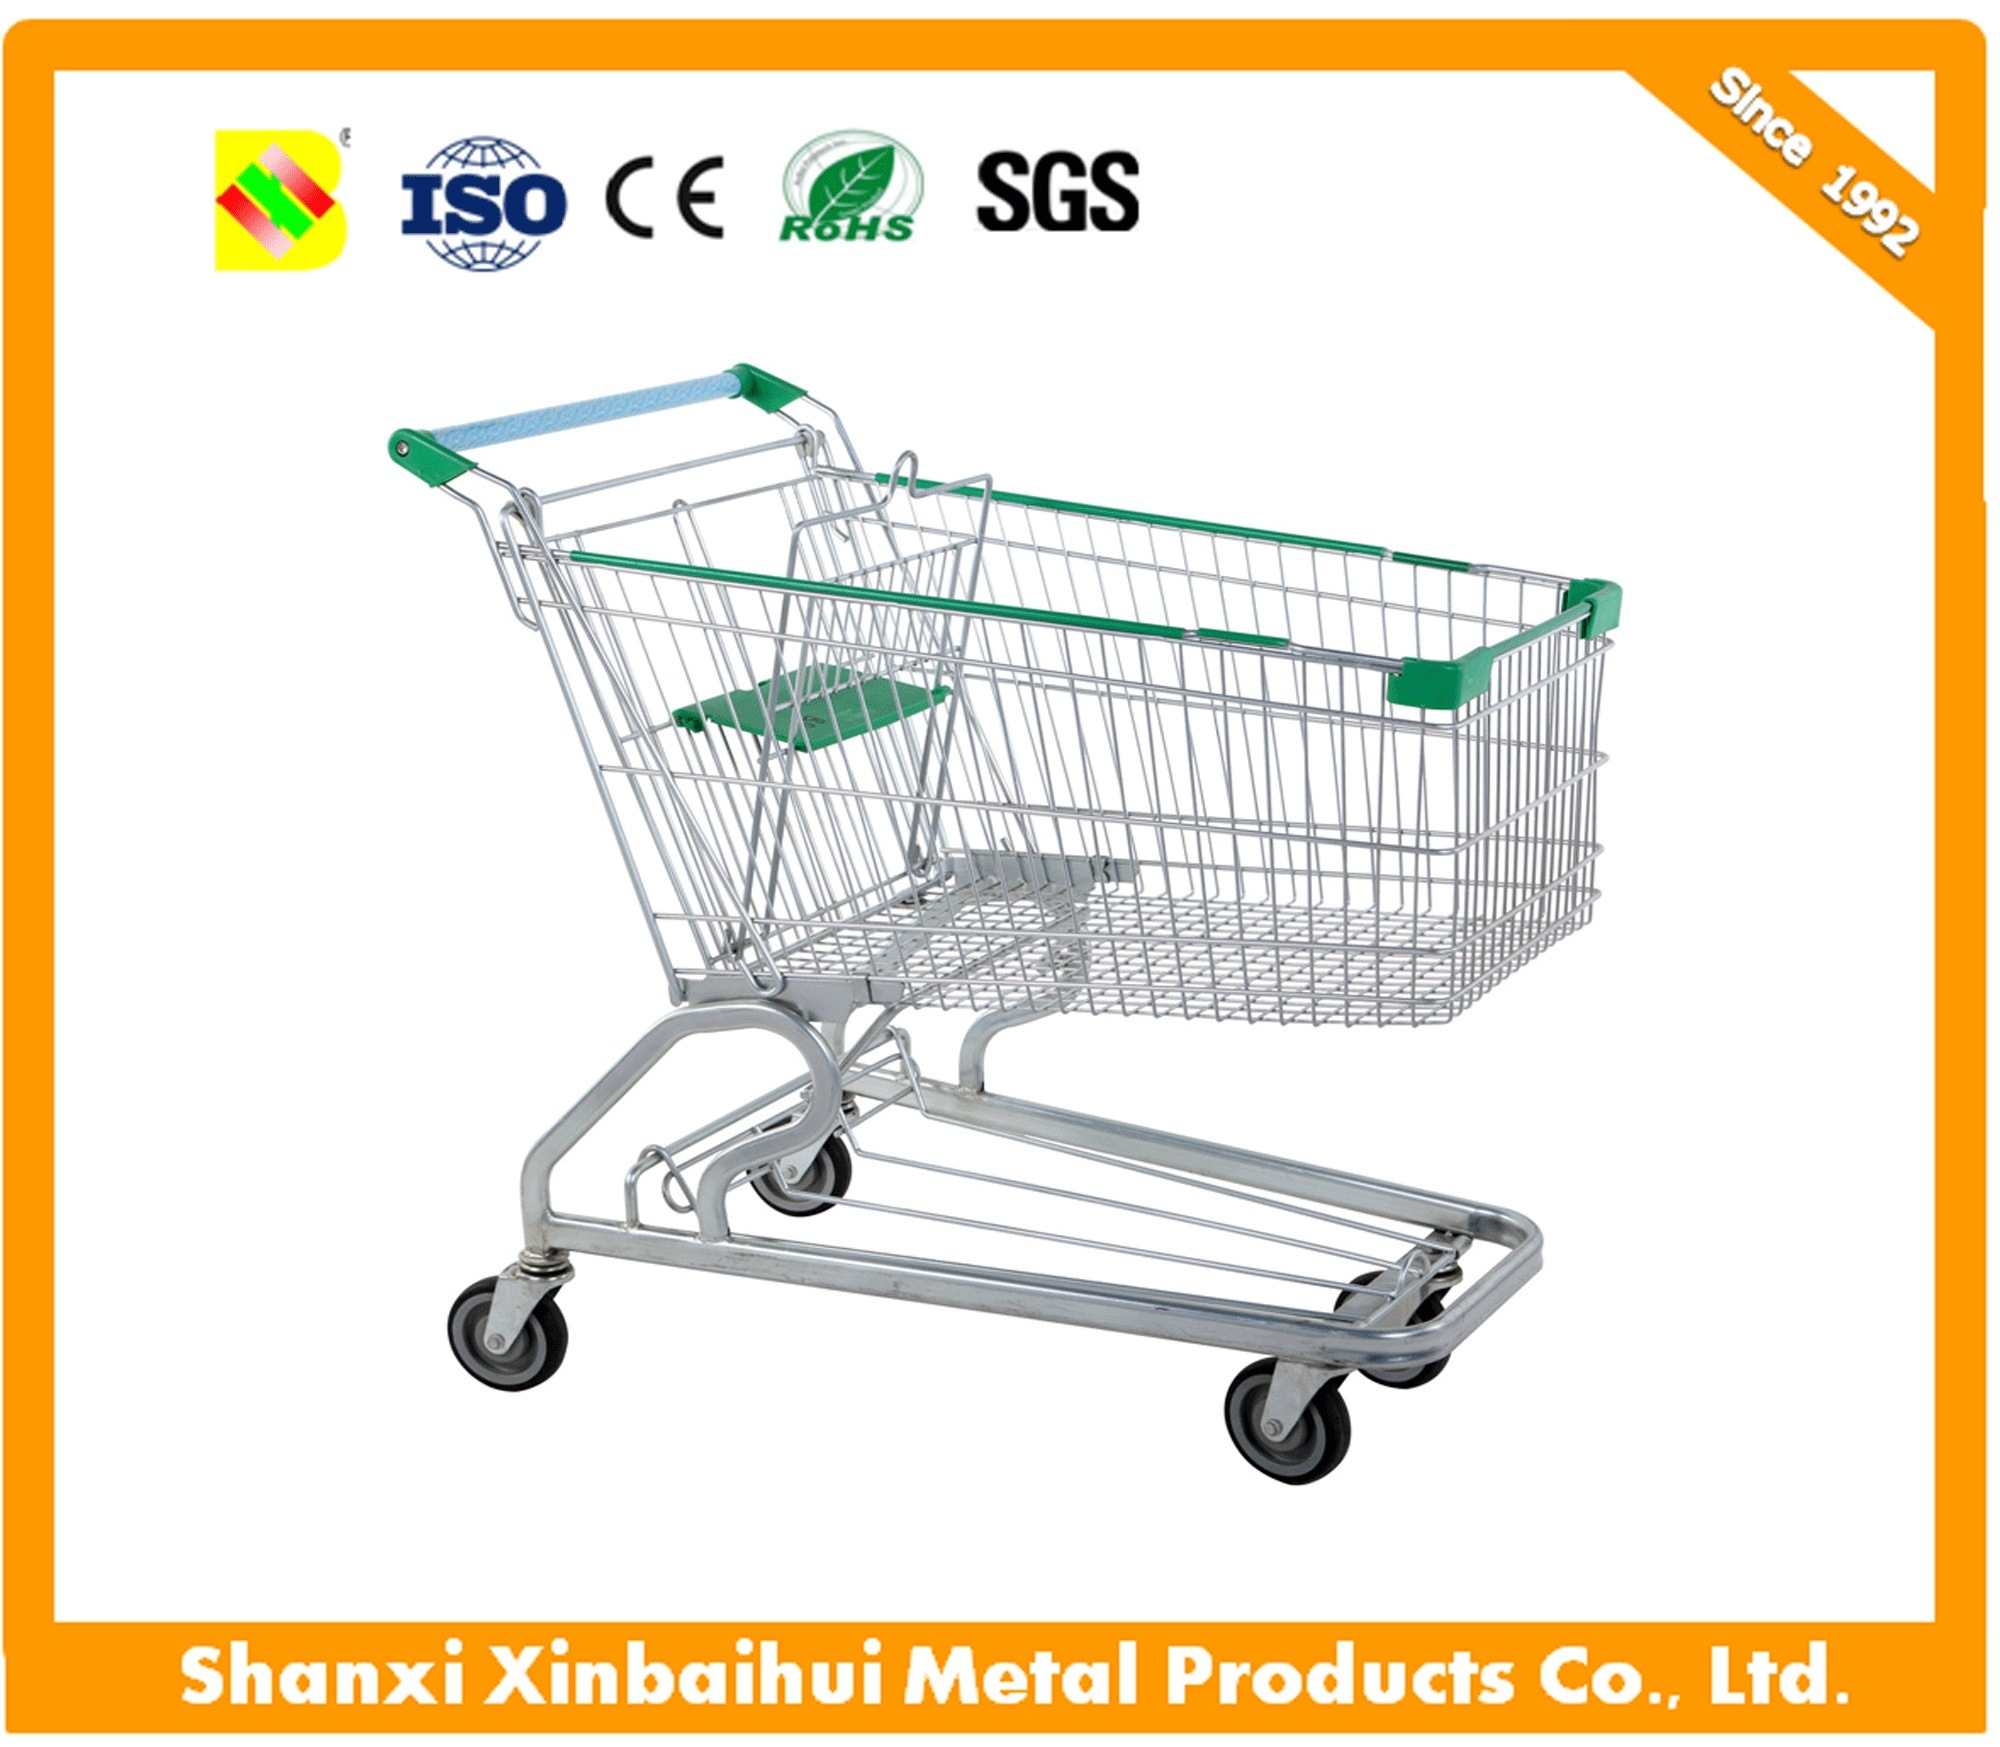 China Wholesale Cheap Price Supermarket Push Cart Retail Grocery